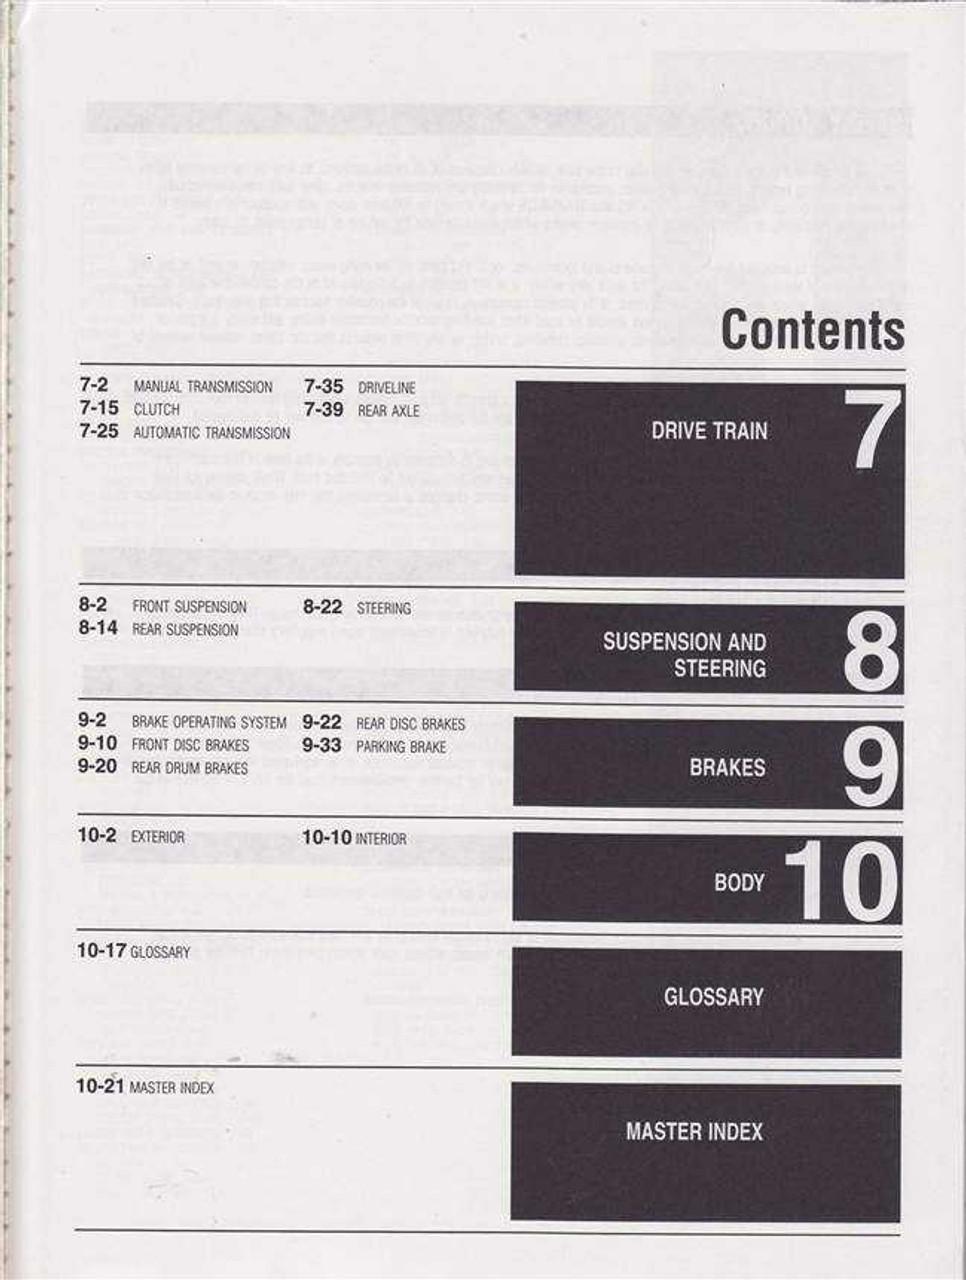 Nissan Datsun 200SX / 510 / 610 / 710 /810 / Maxima 1973 - 1984 Workshop  Manual